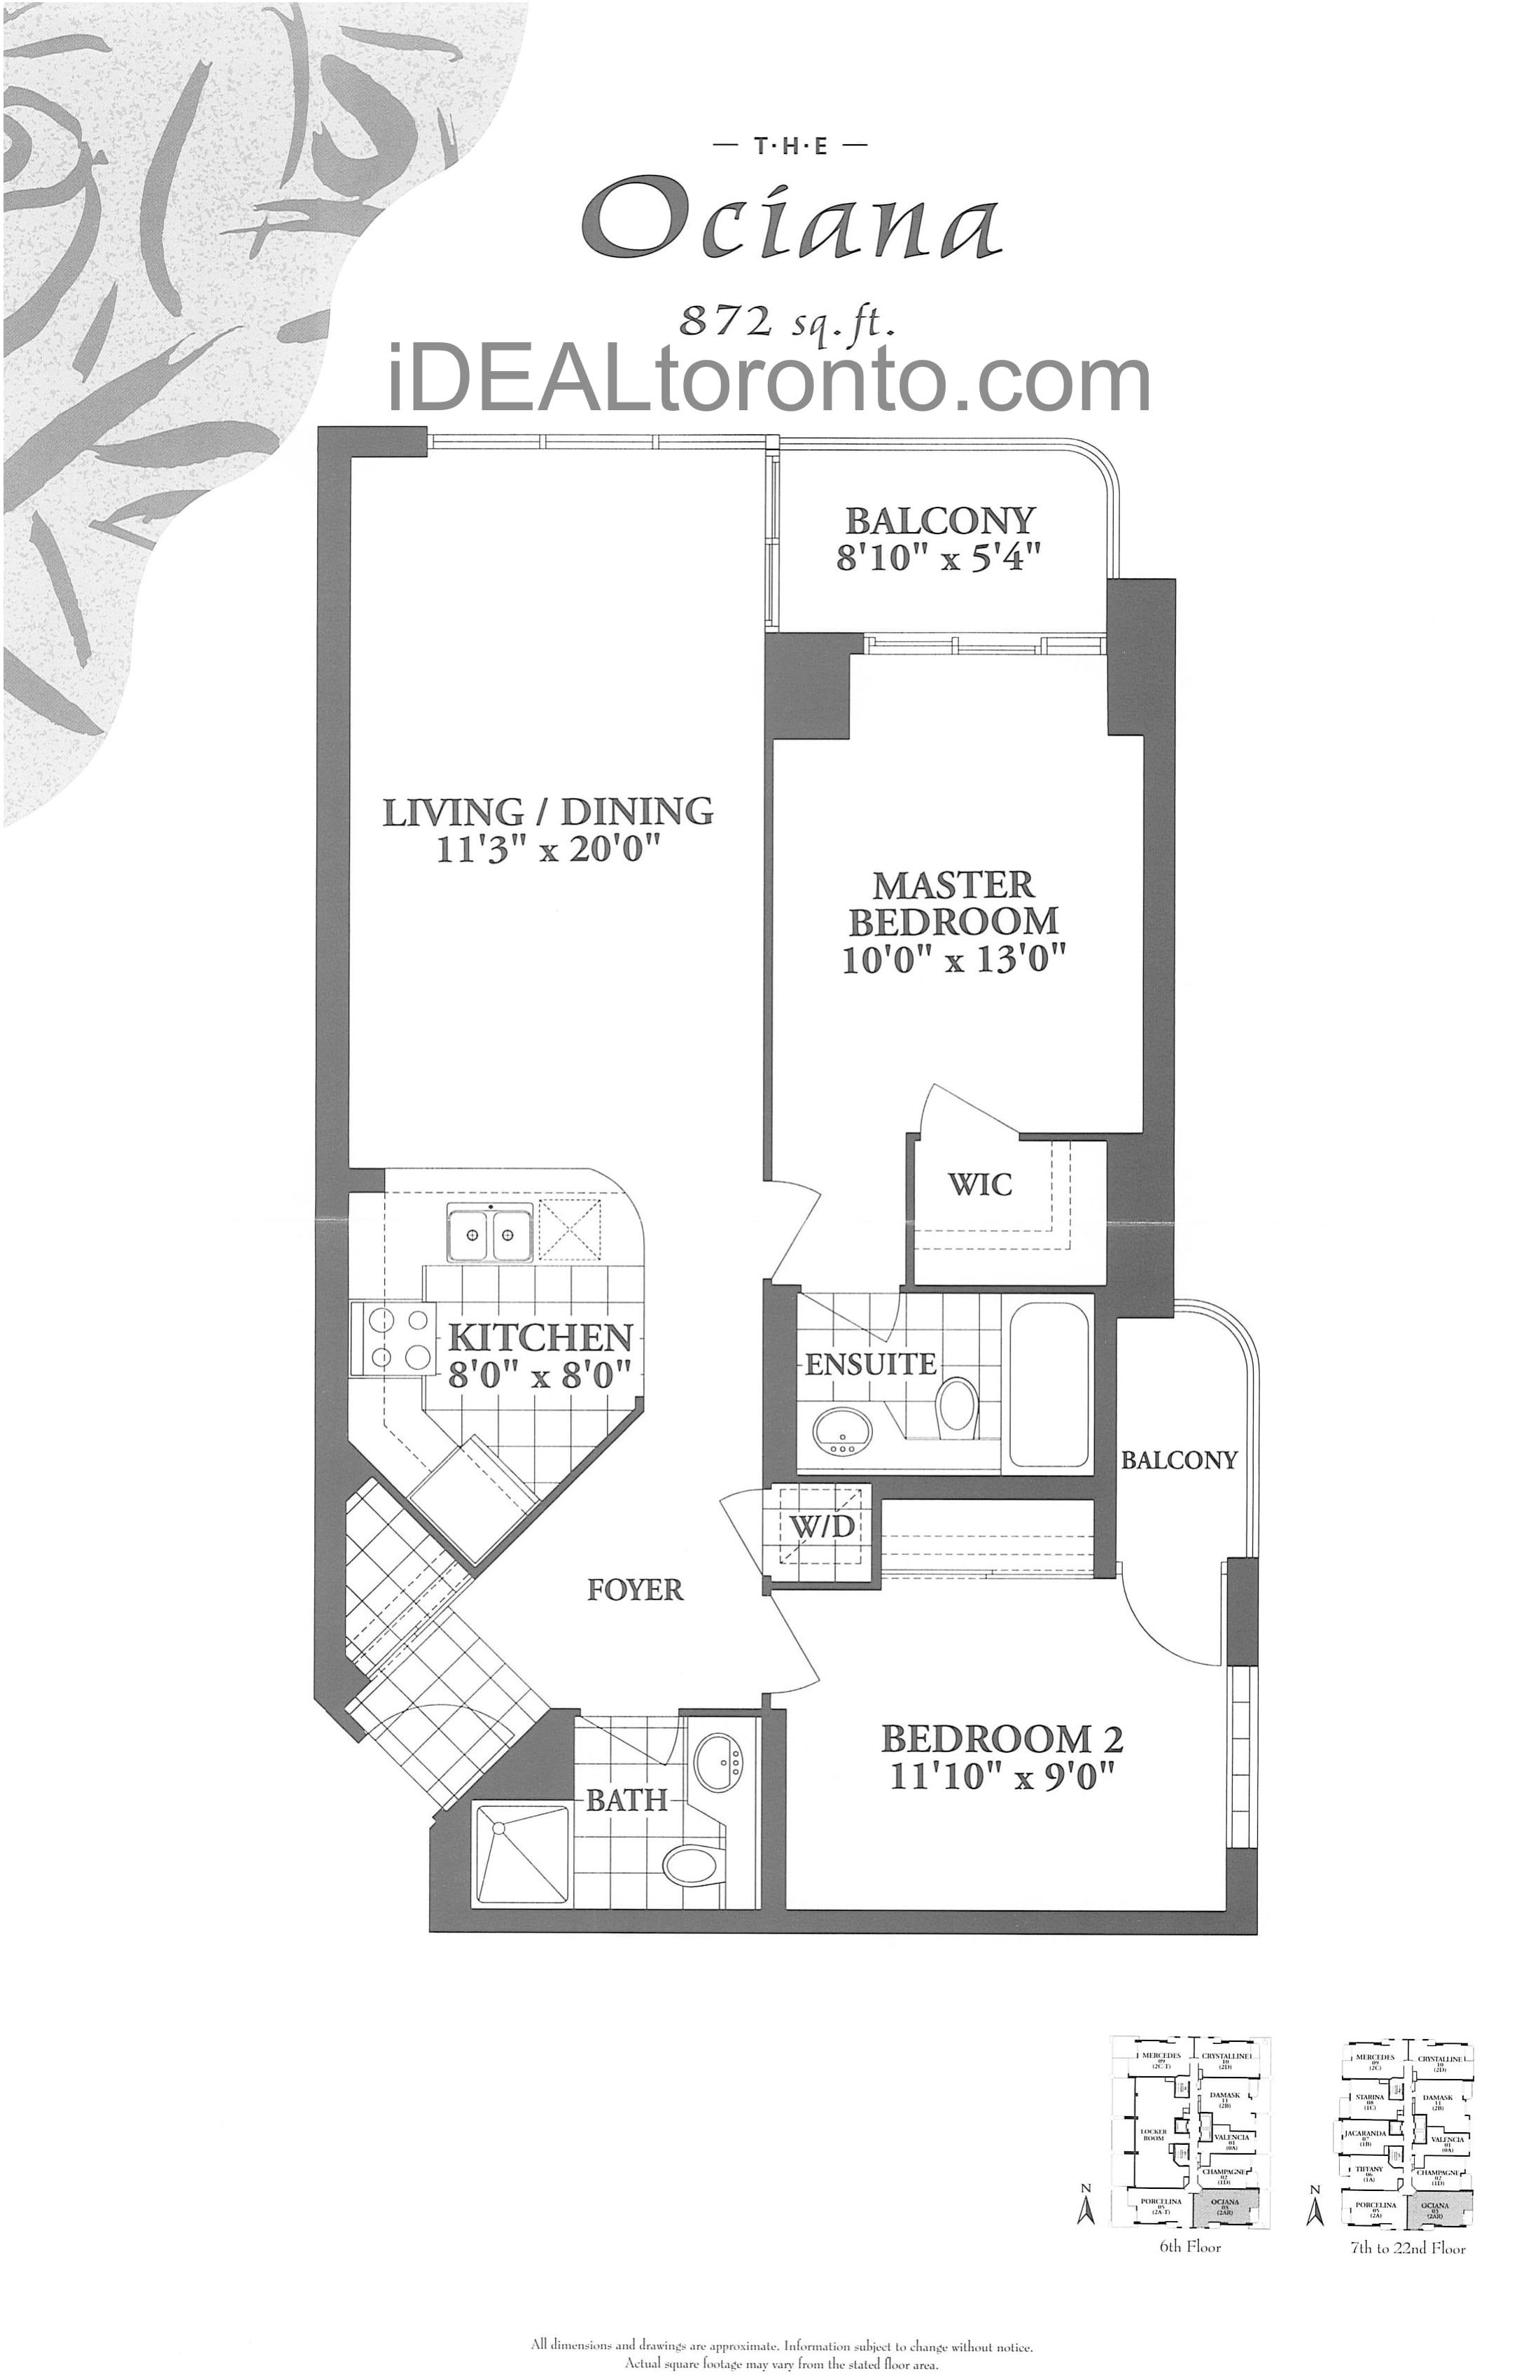 The Ociana: 2 Bedroom, 872 SqFt